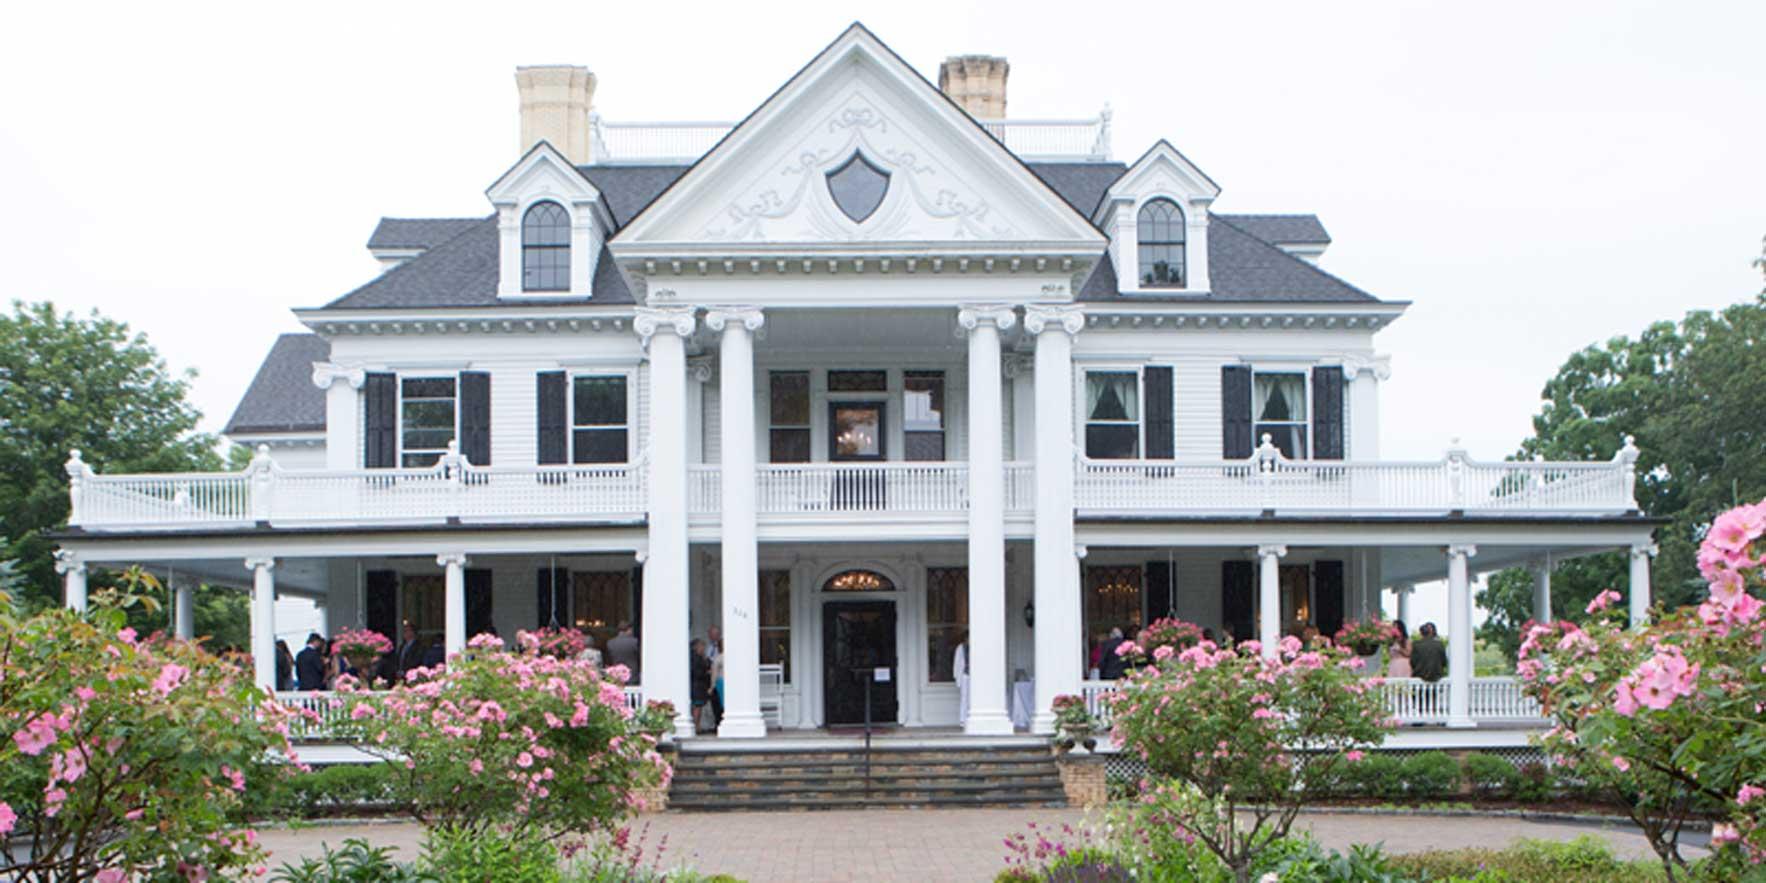 rushmead rushmead house historic historic